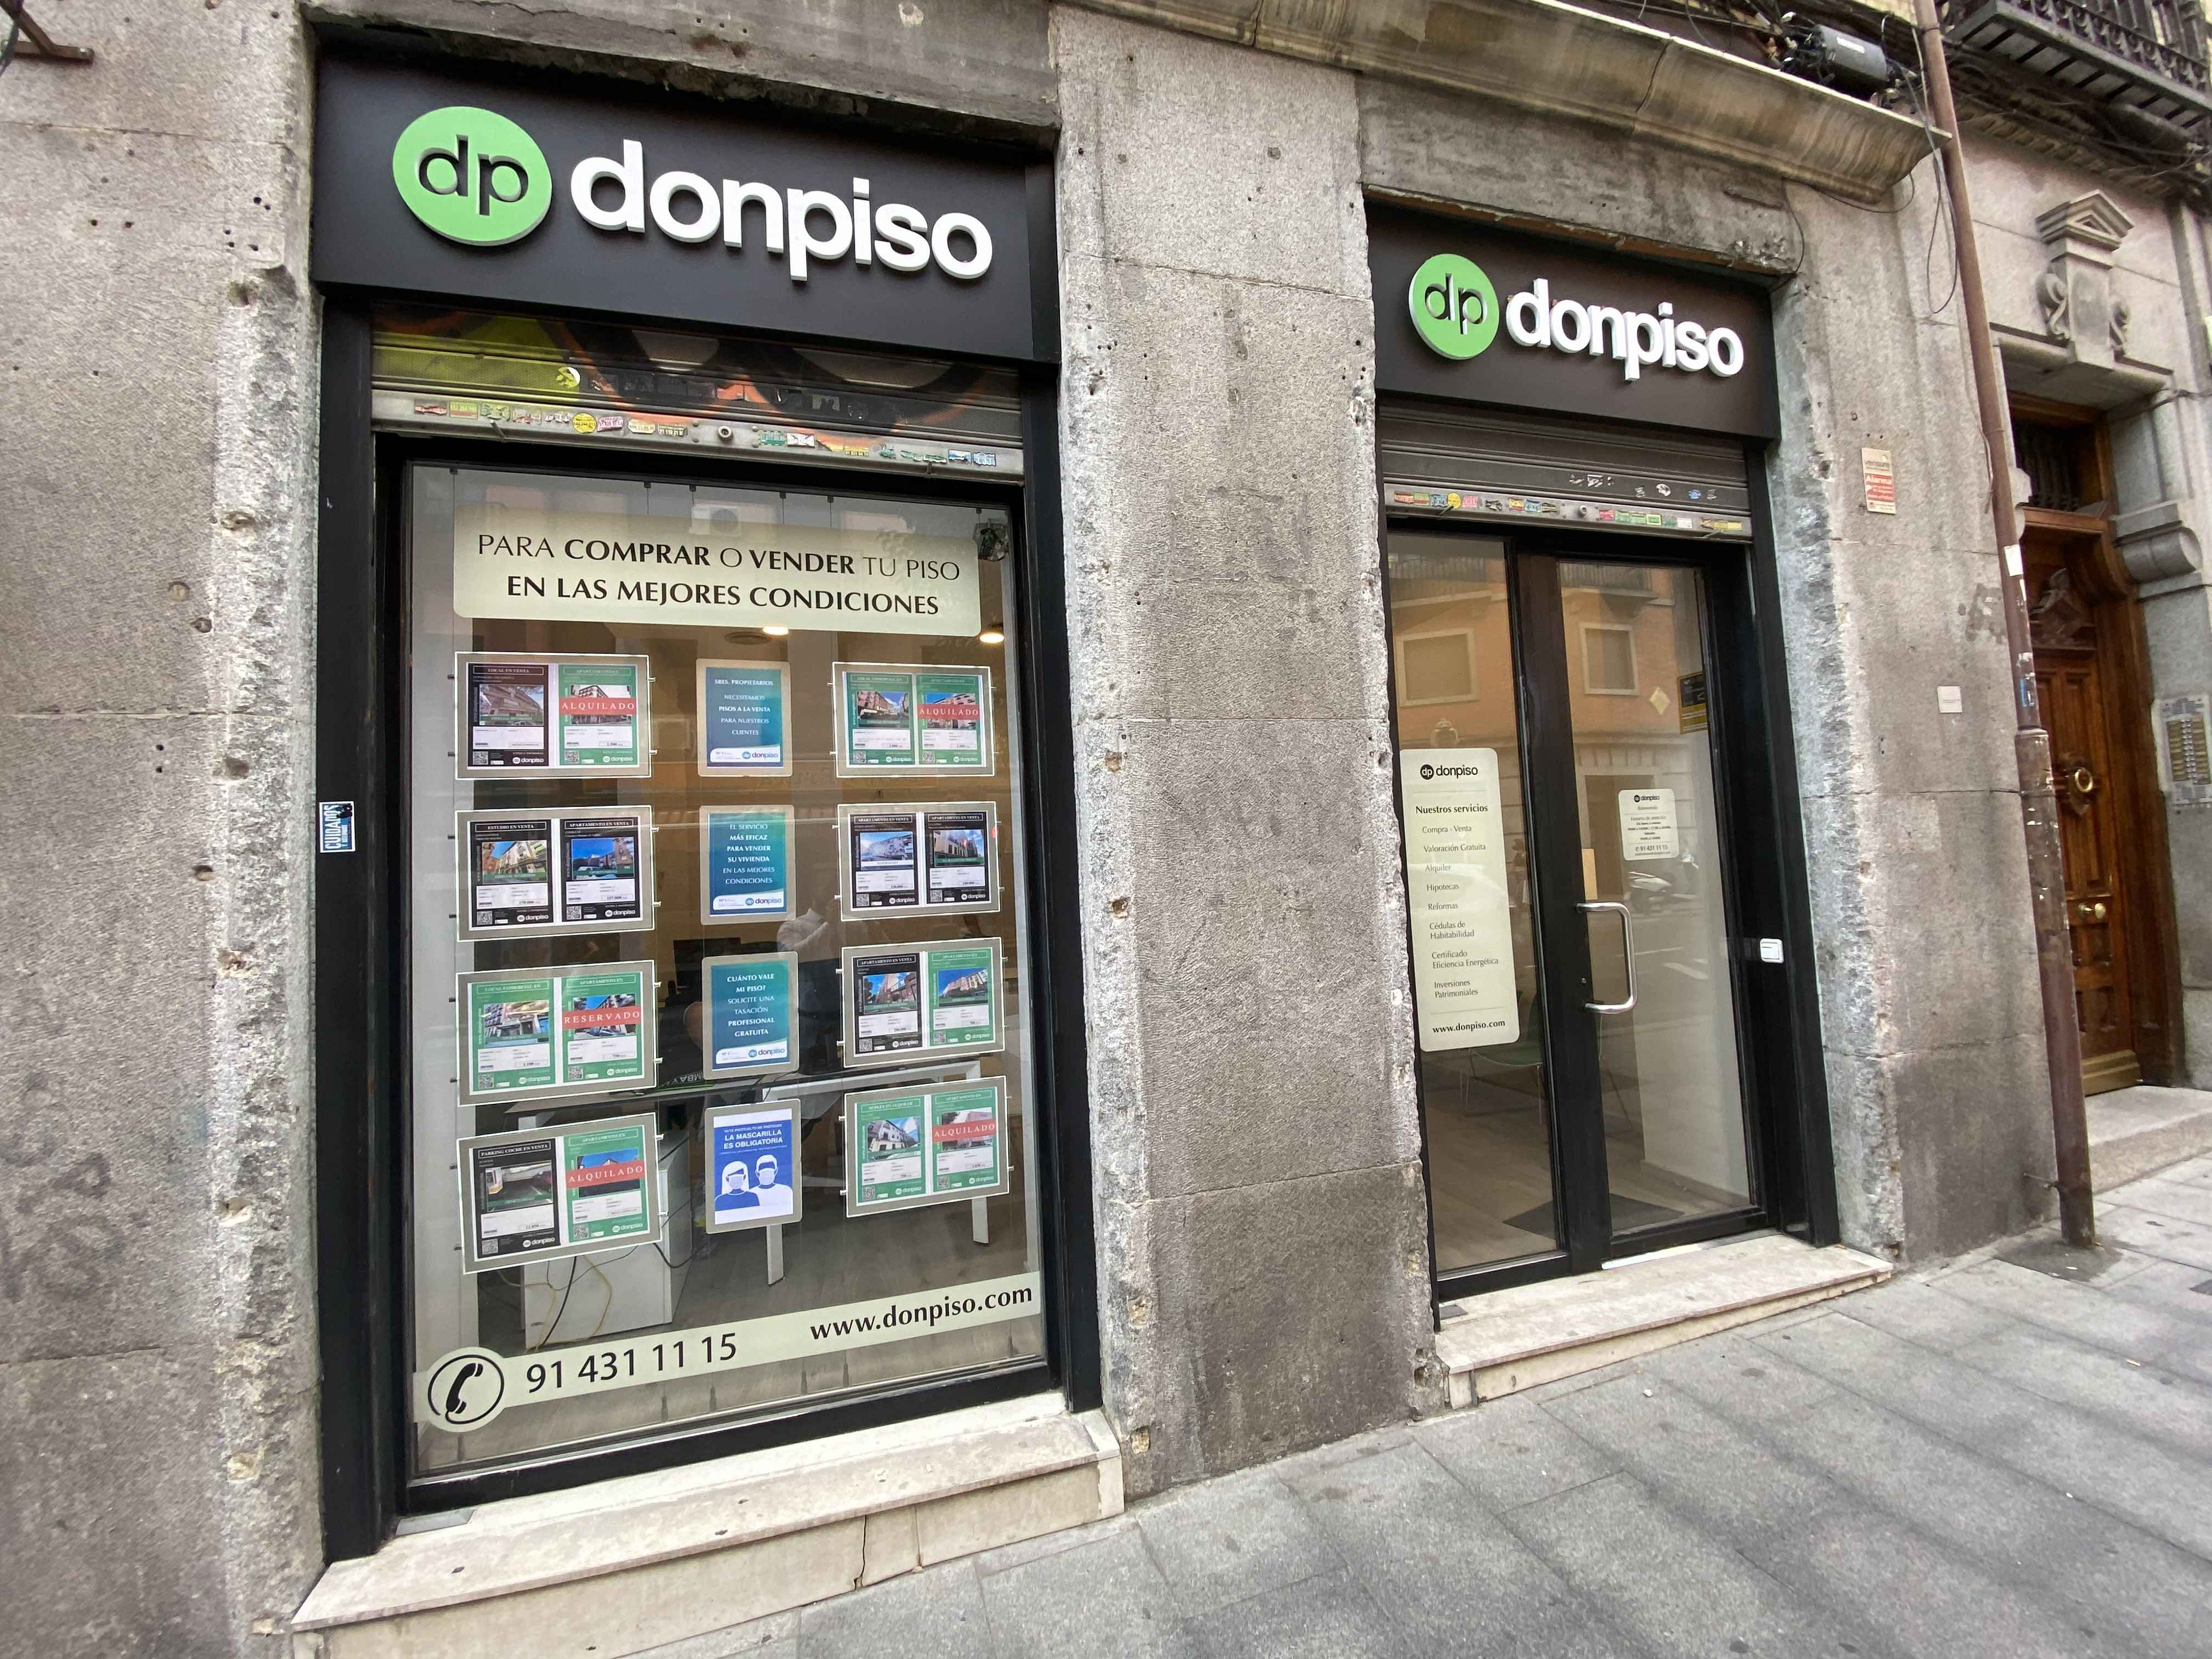 oficina donpiso Madrid La Latina